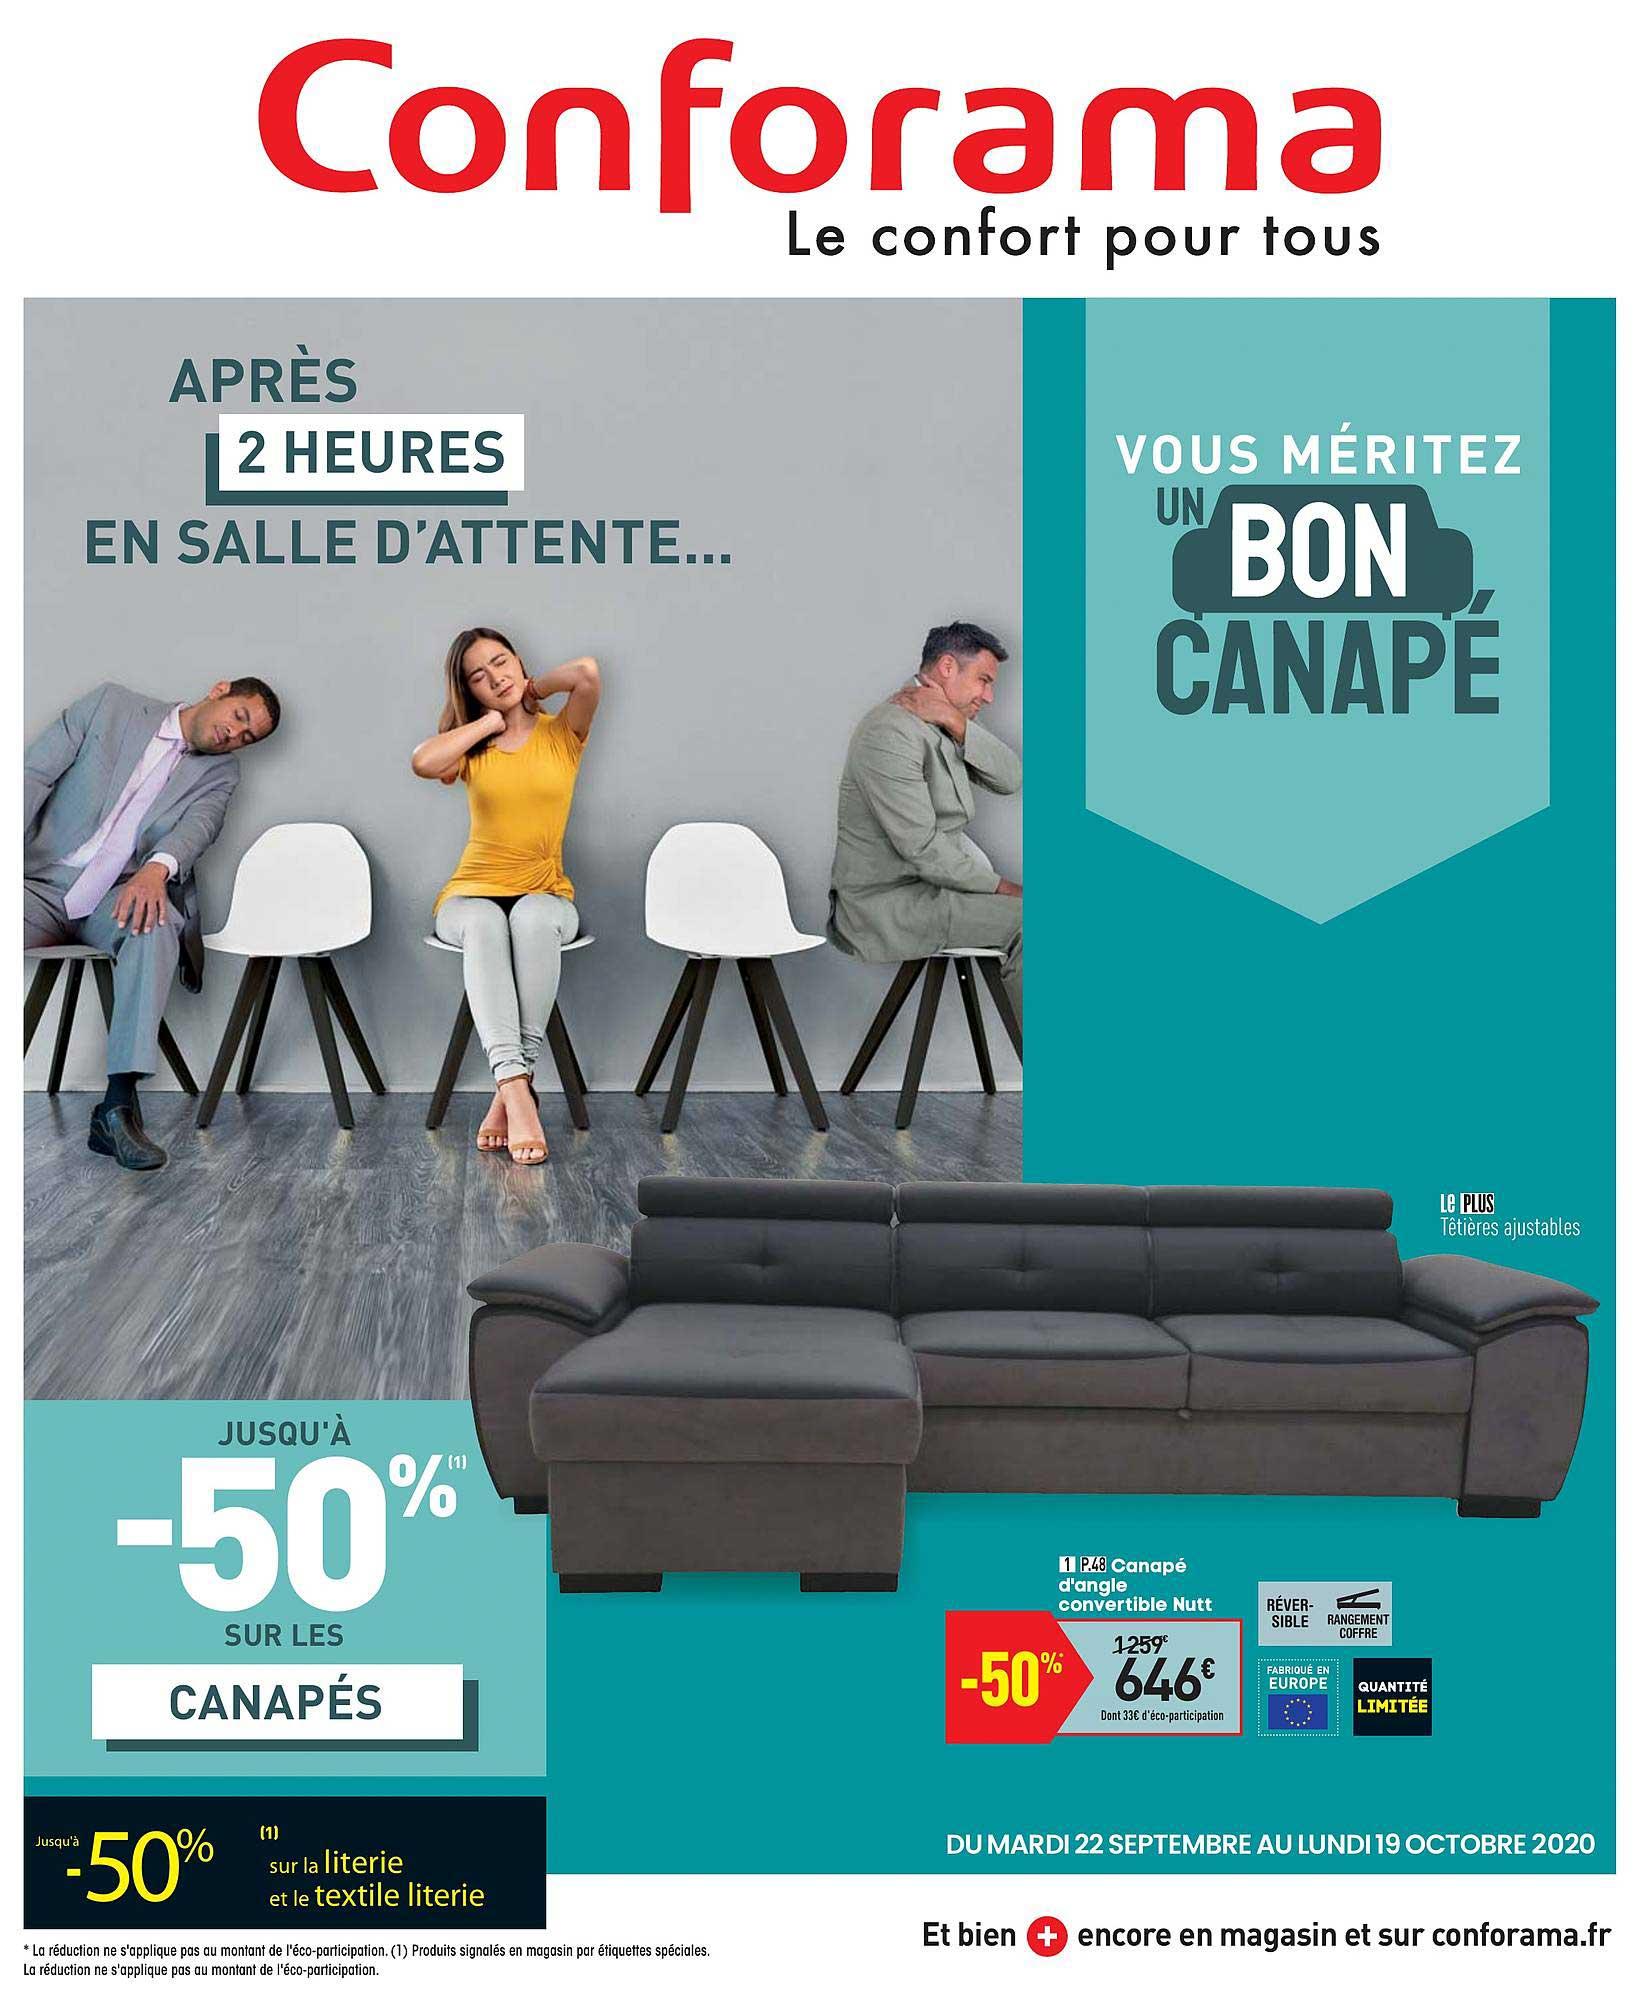 Offre Canapé D'Angle Convertible Ally 2 Chez Conforama concernant Canapé Ally 2